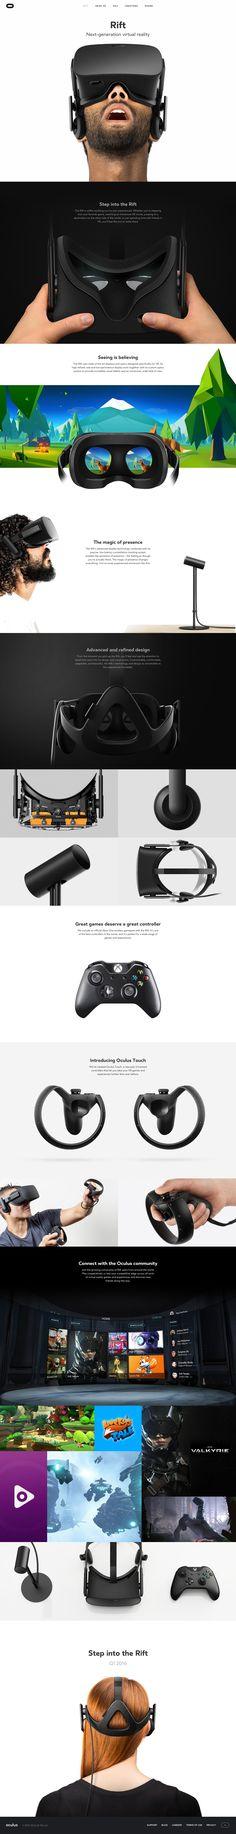 Oculus Rift landing page design inspiration - Lapa Ninja Design Web, Page Design, Webdesign Inspiration, Web Inspiration, Virtual Reality Goggles, Augmented Reality, Web Layout, Layout Design, Rollup Design